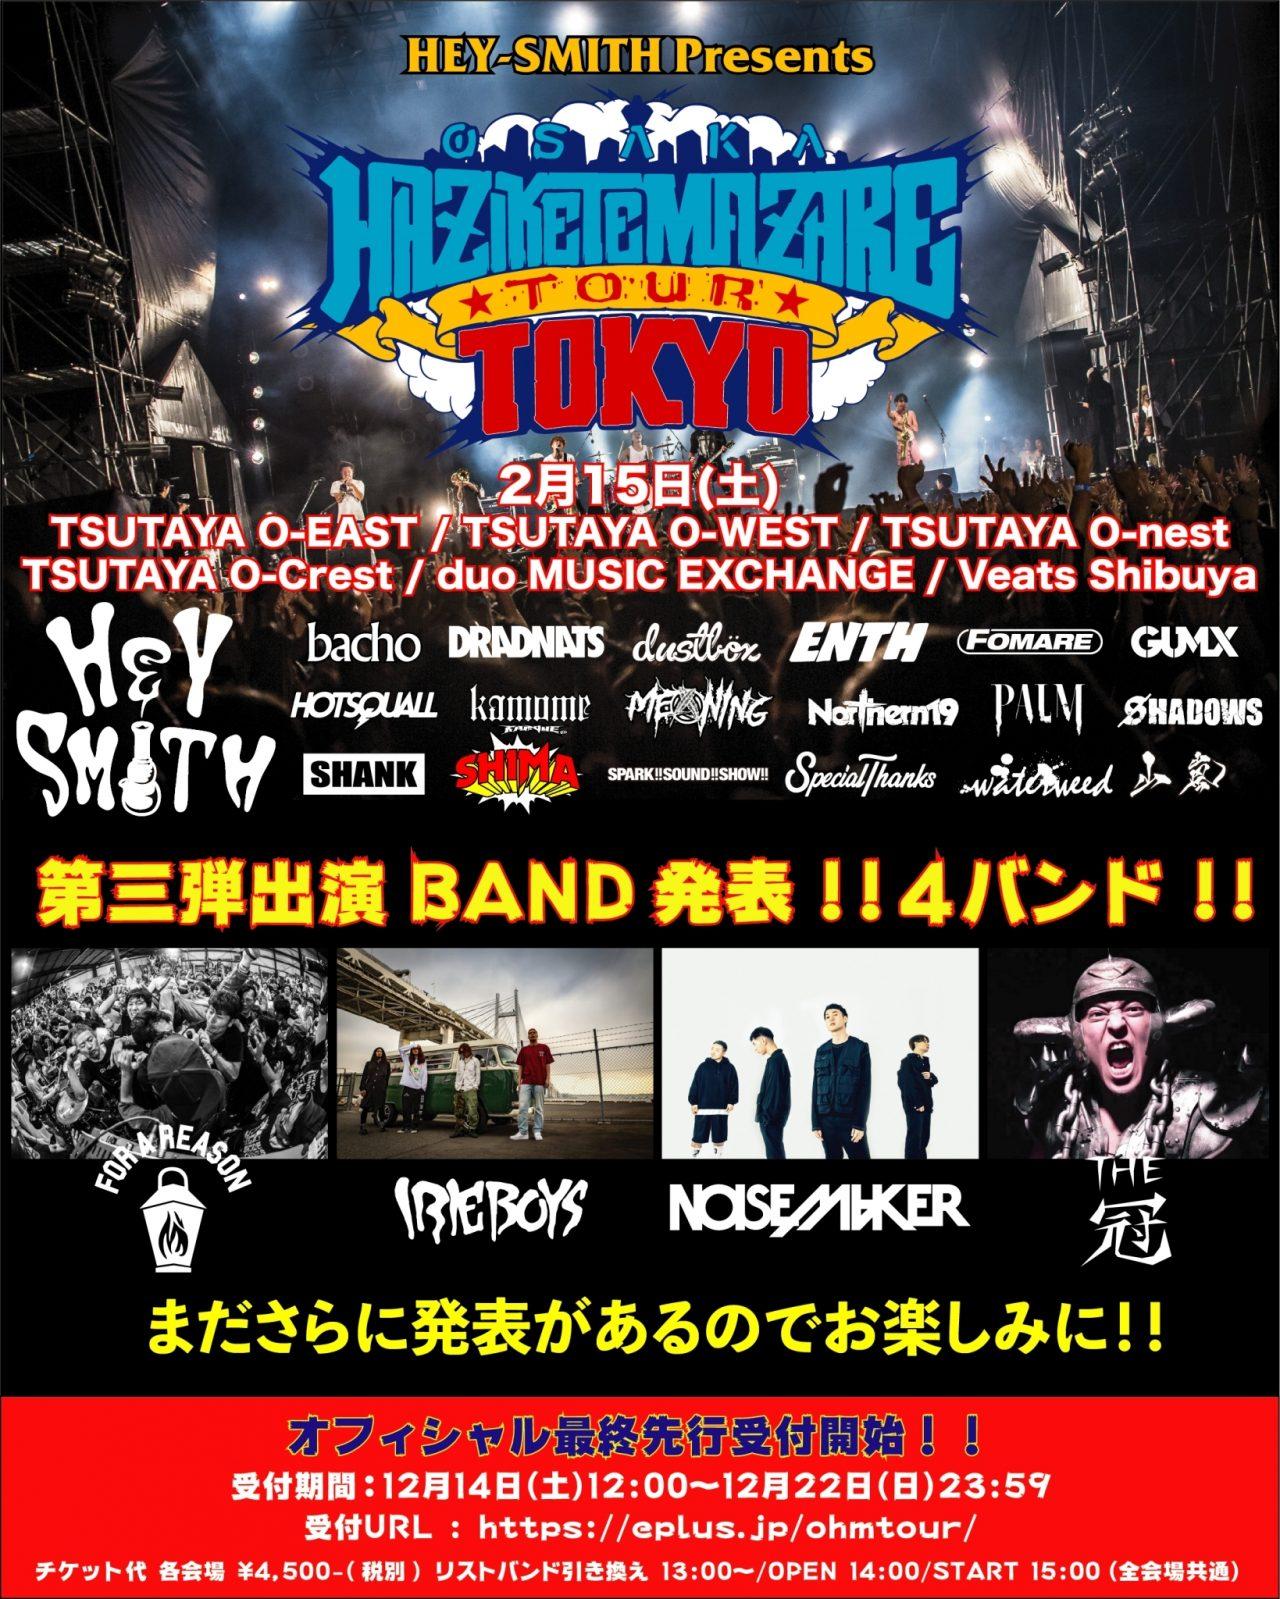 HAZIKETEMAZARE TOUR TOKYO